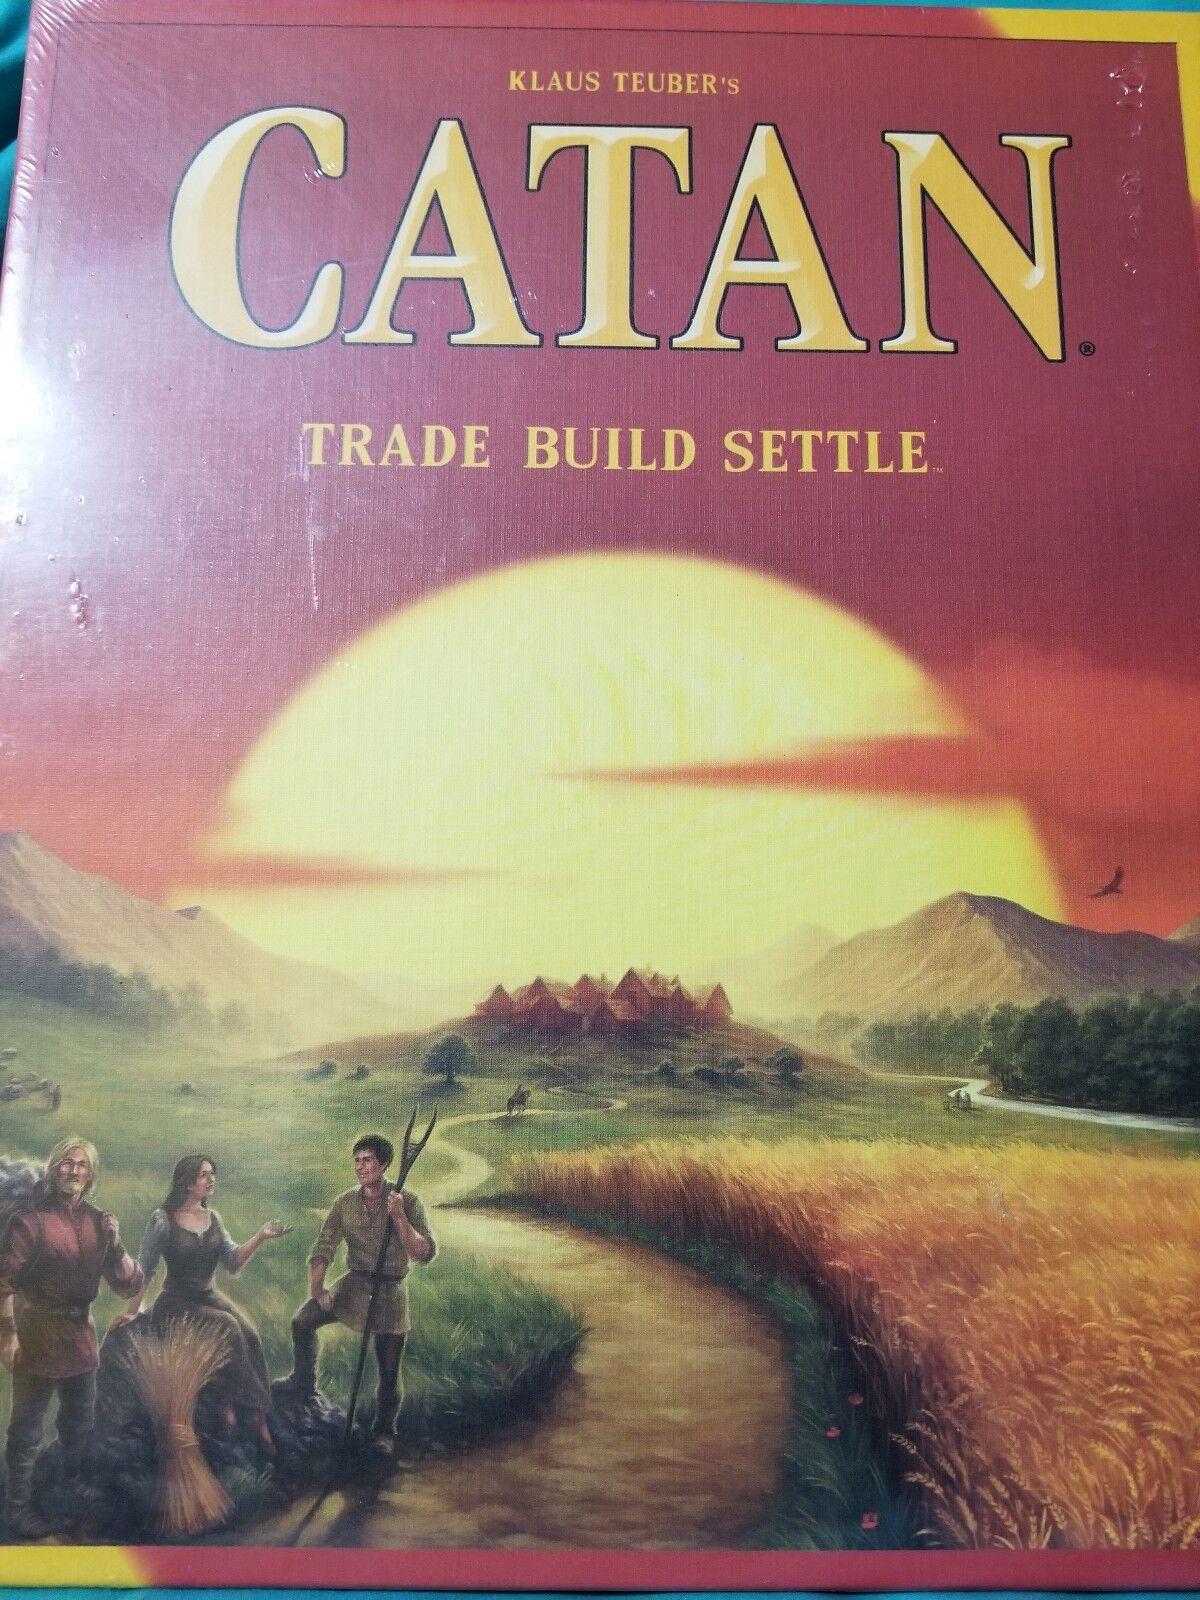 Catan kernsatz 5. familie brettspiel - handel bauen sich soziale interaktive 3071